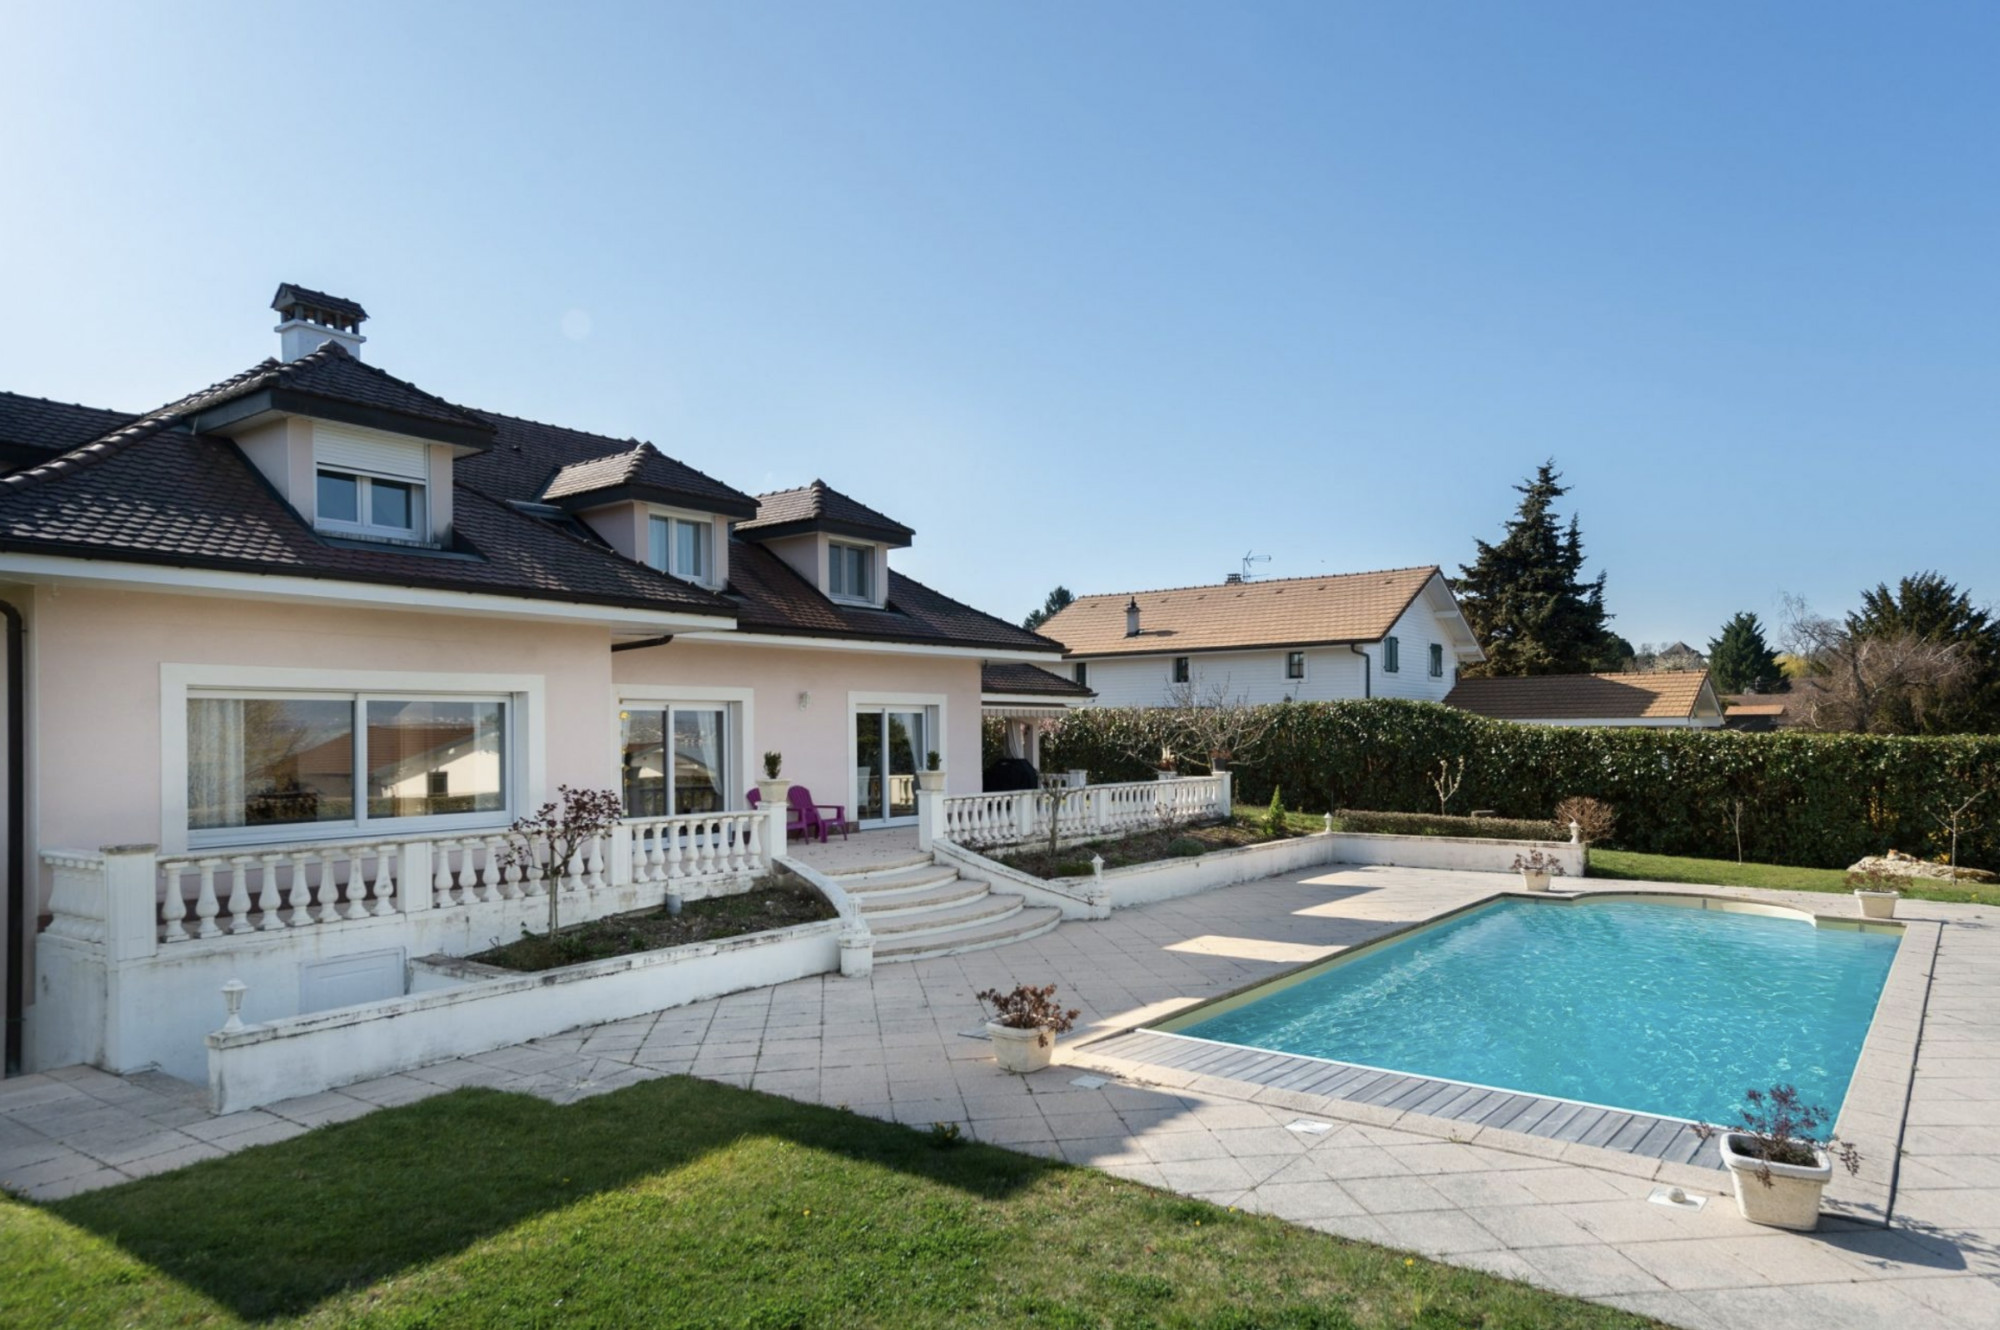 Luxury villa for sale in Chens sur Leman Lake Geneva